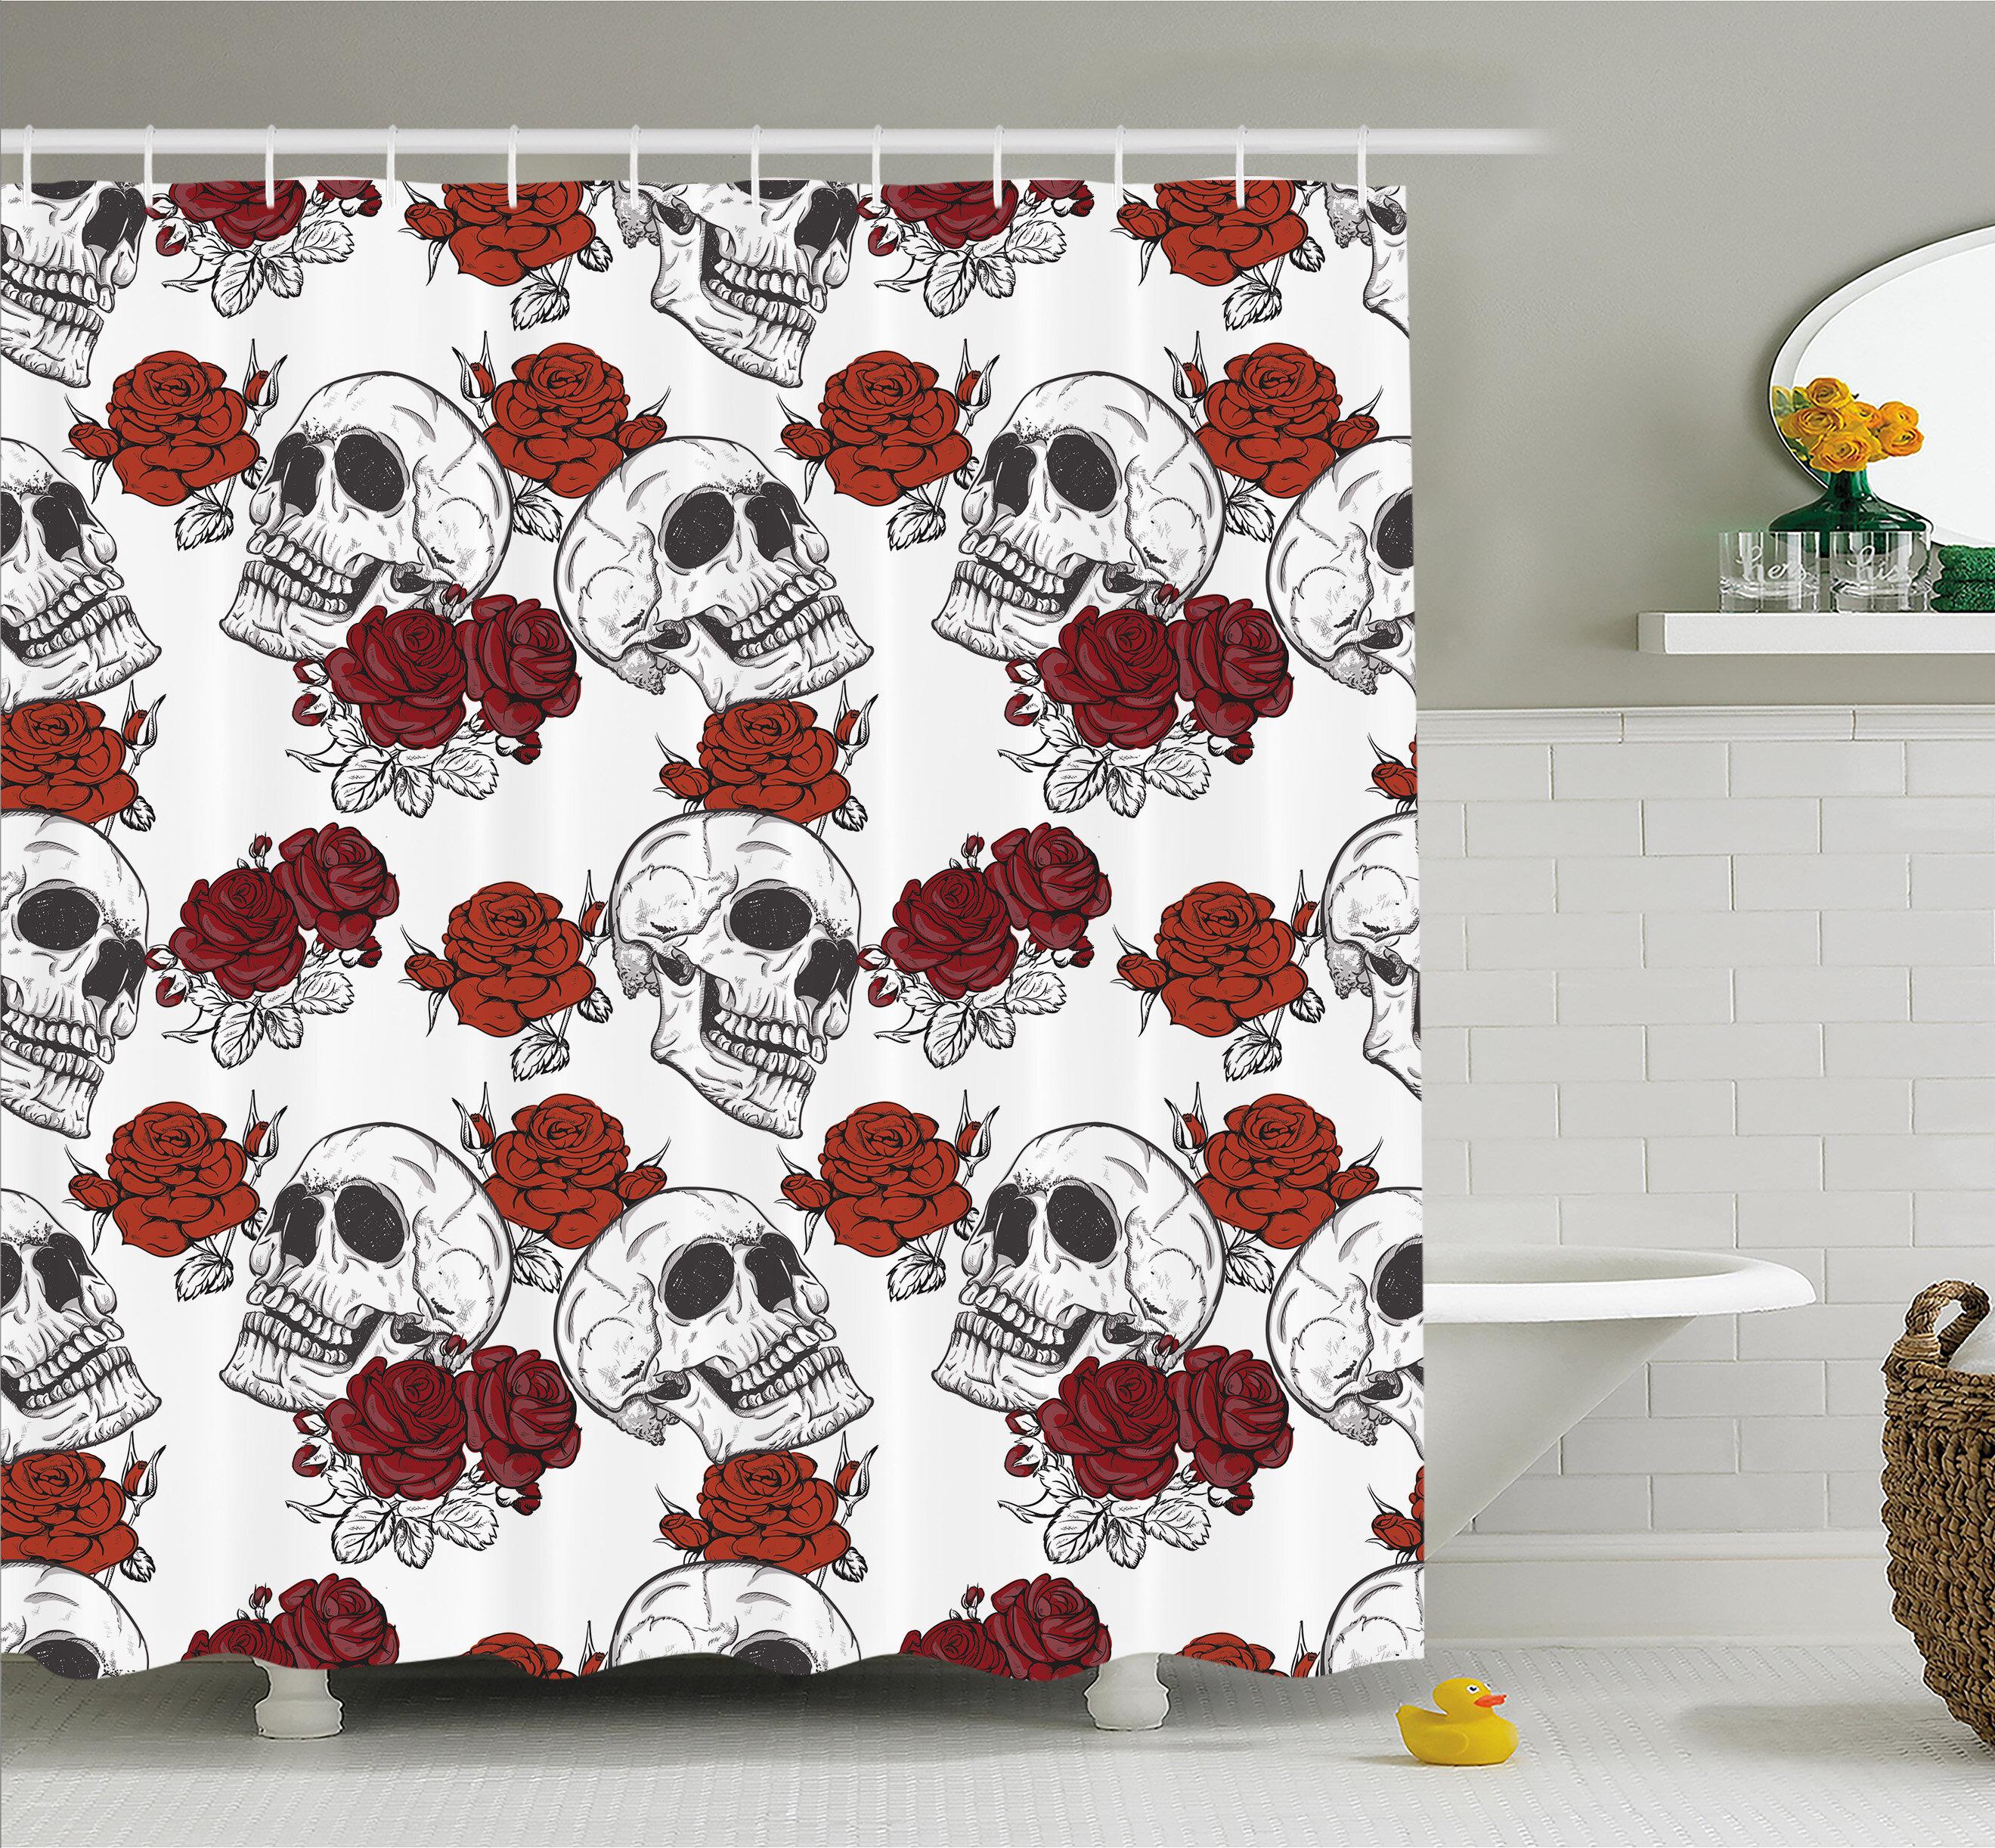 Halloween Horror Skeleton Skull Shower Curtain Set Bathroom Fabric Bath Curtains